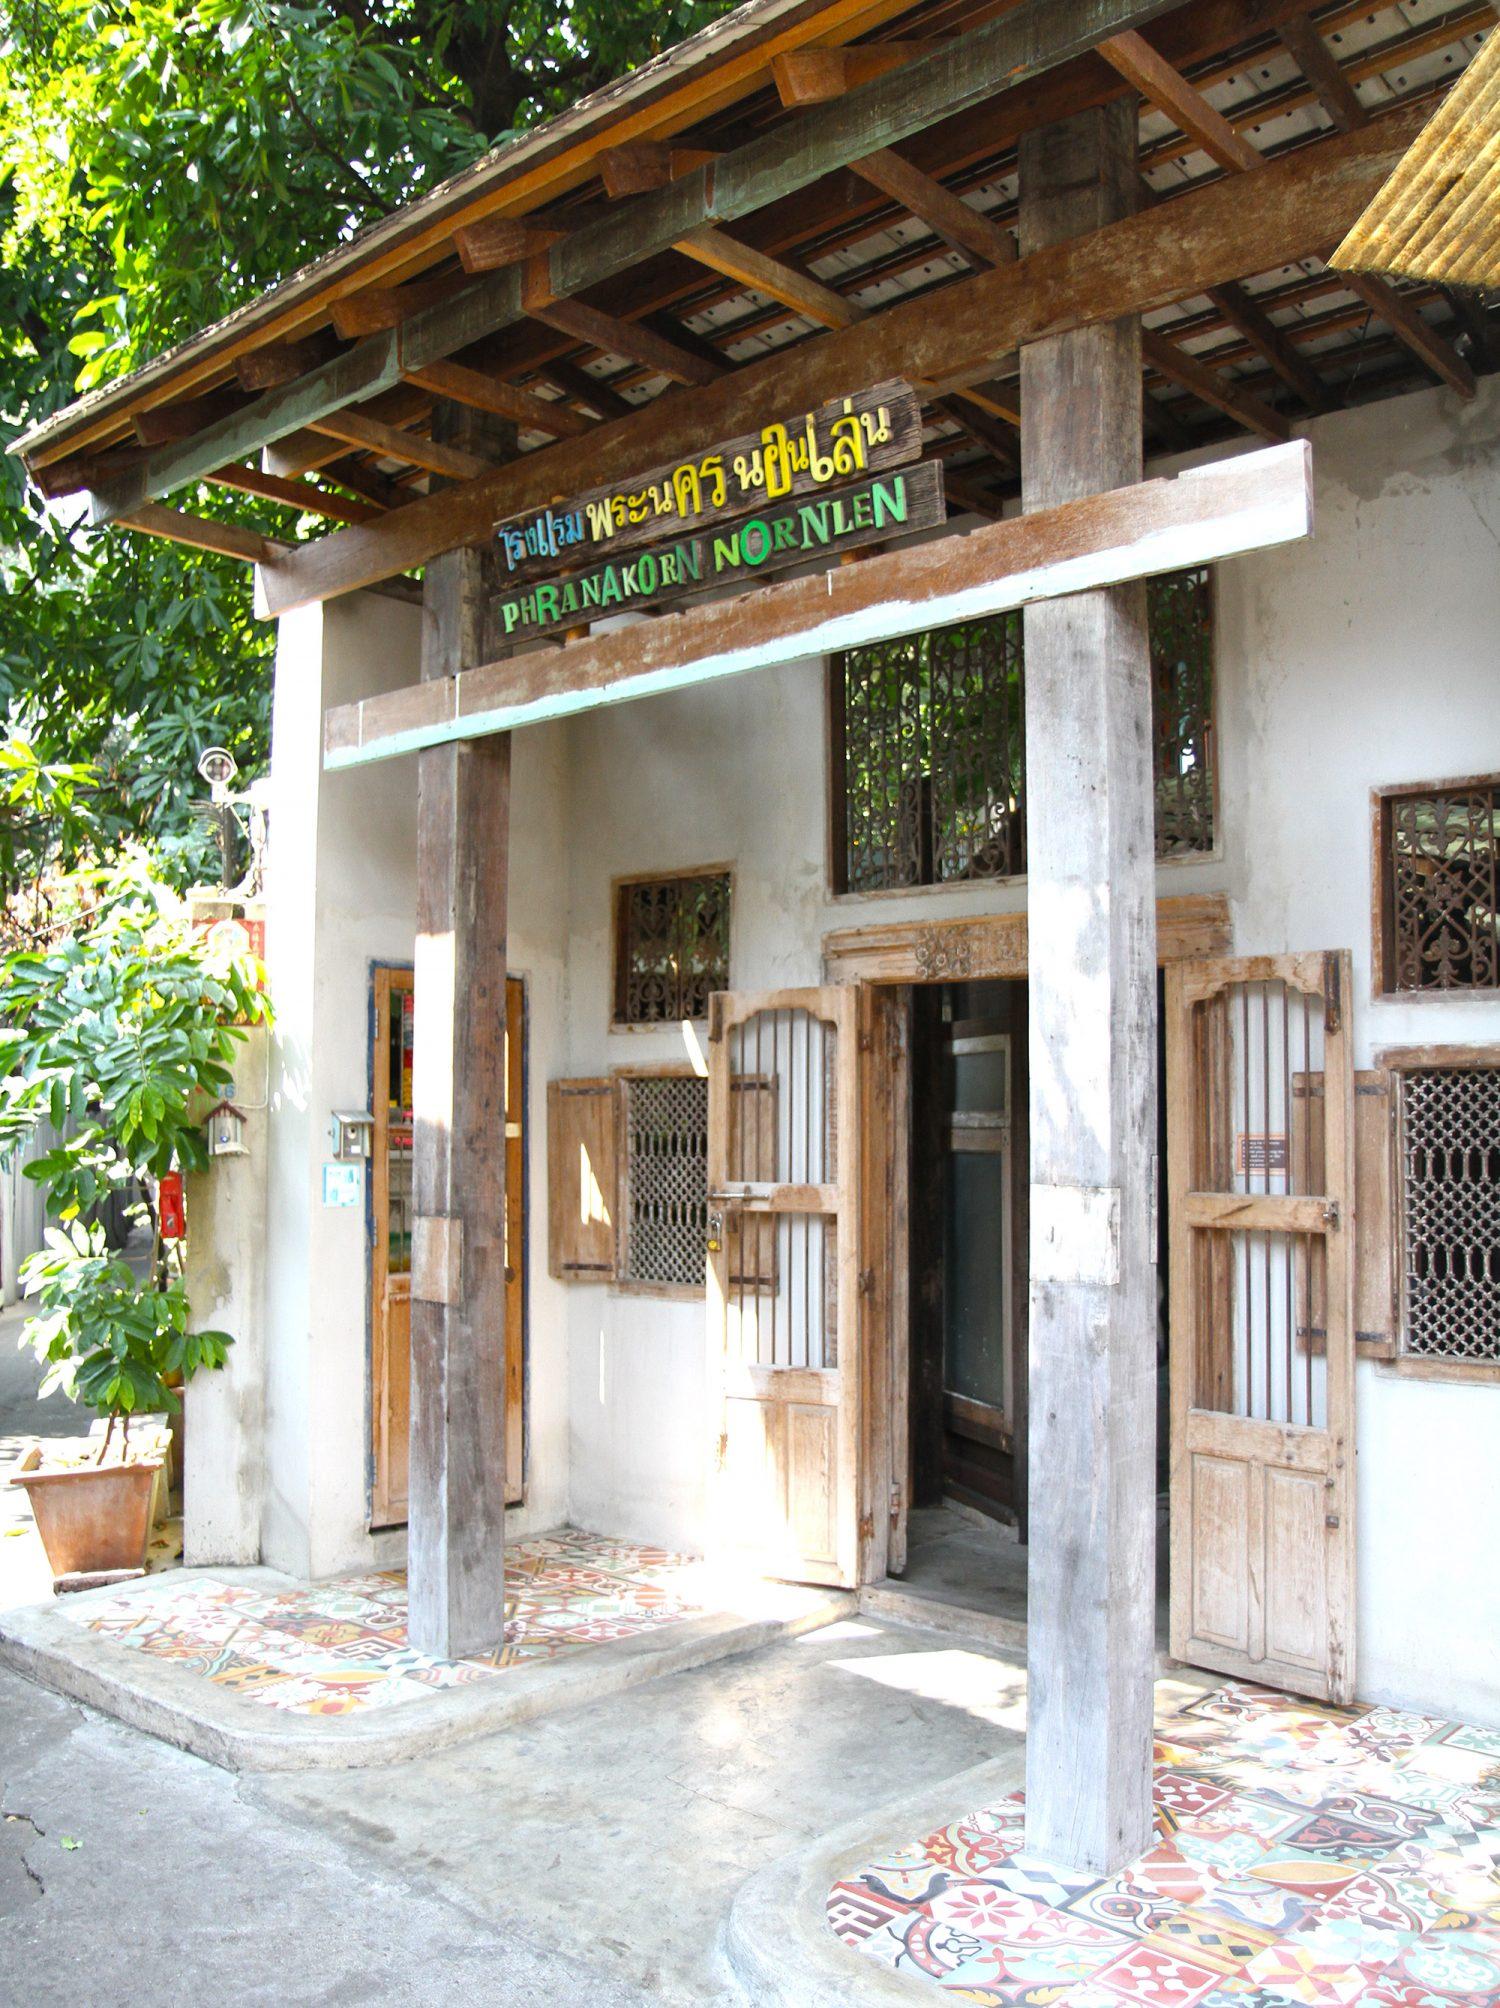 Hôtel Phranakorn-Nornlen à Bangkok